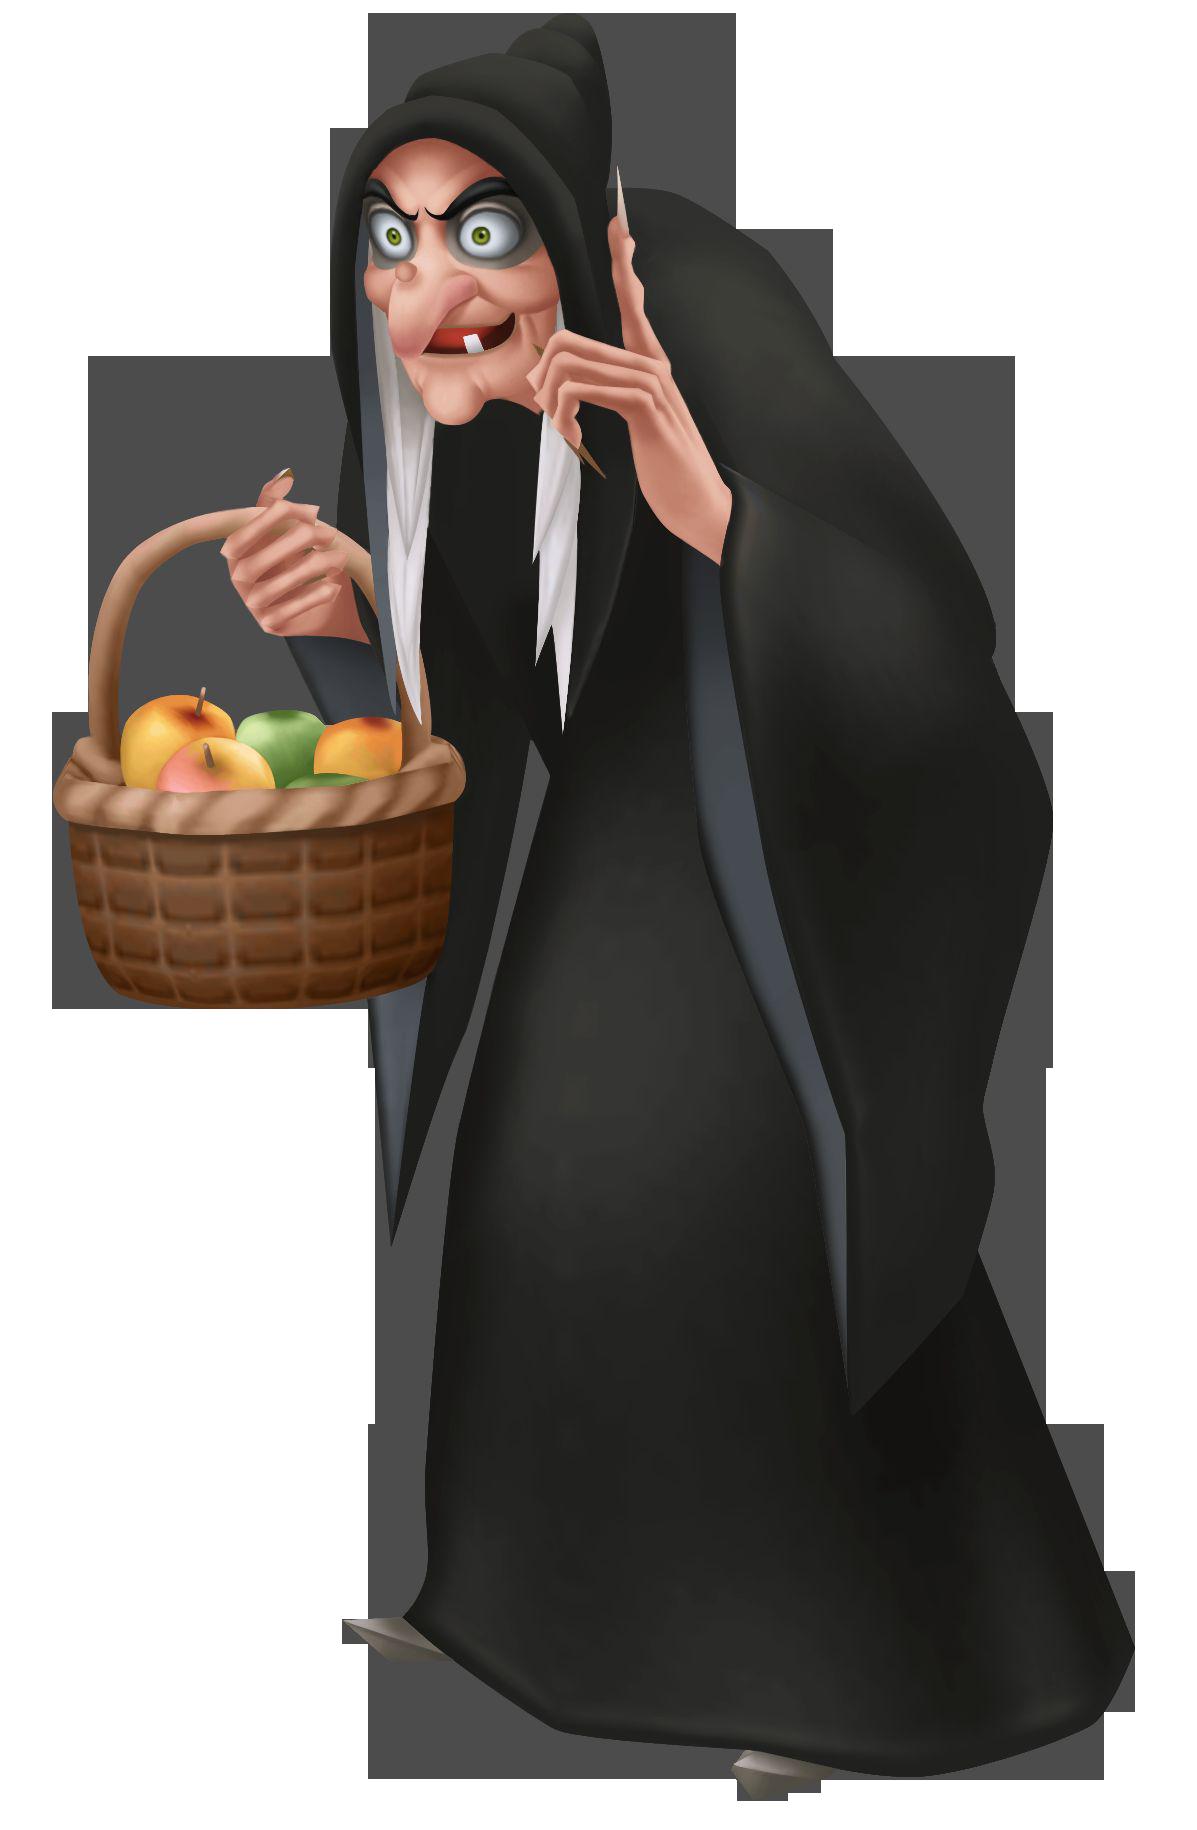 Disney poison apple clipart jpg royalty free library The Evil Queen | ягуся | Pinterest | Evil queens, Snow white and Snow jpg royalty free library